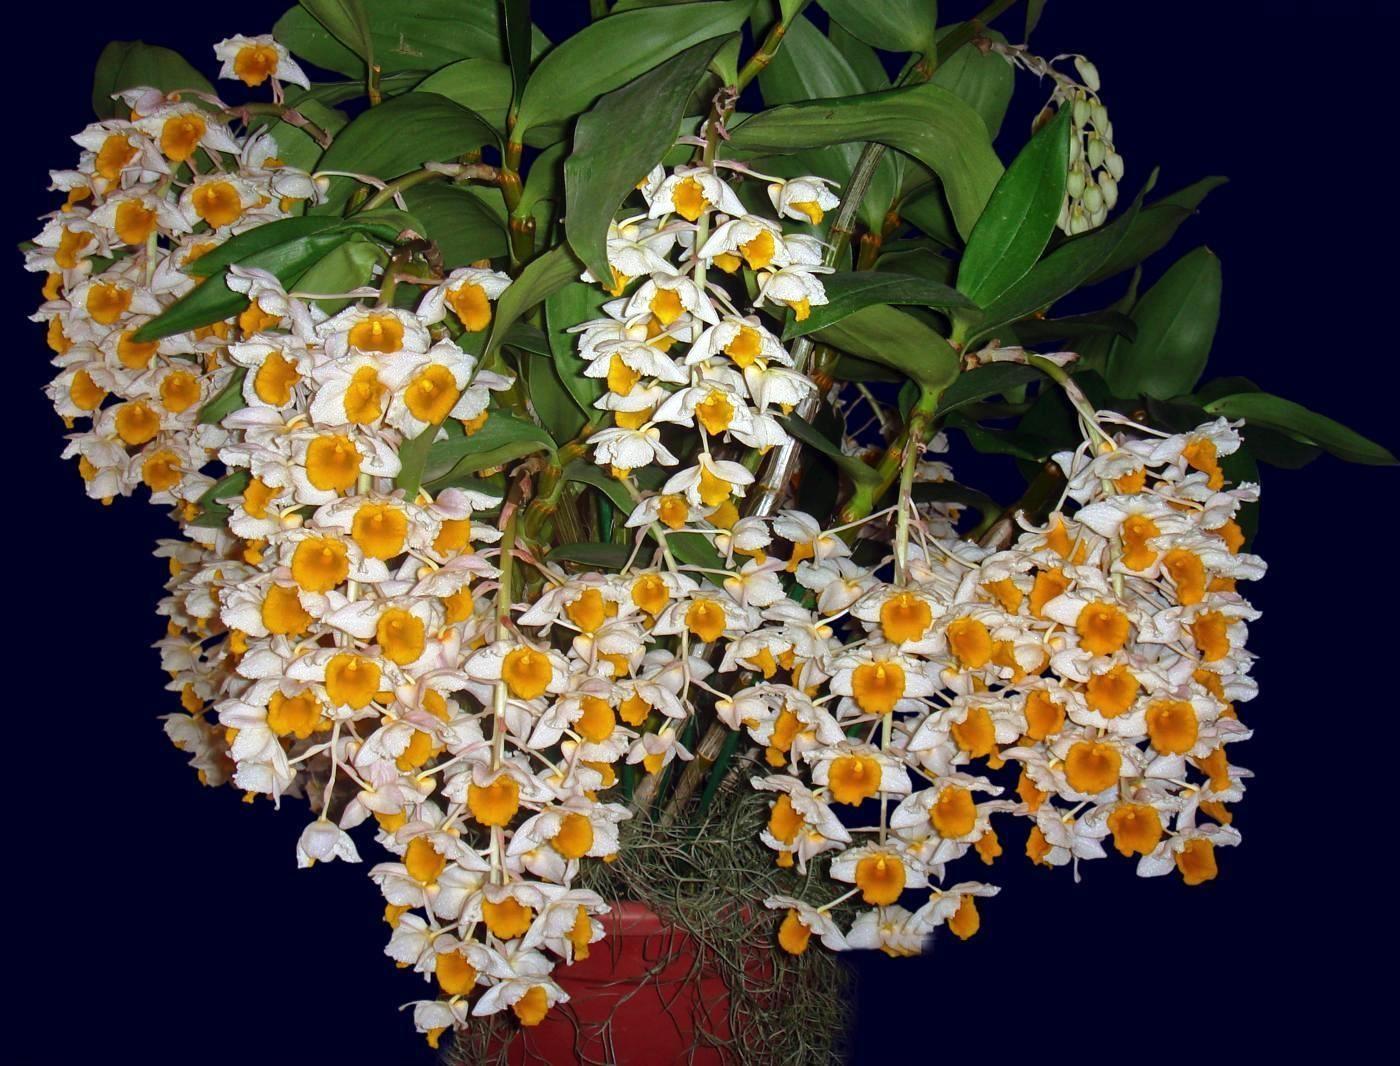 Dendrobium densiflorun var. albo-lutea